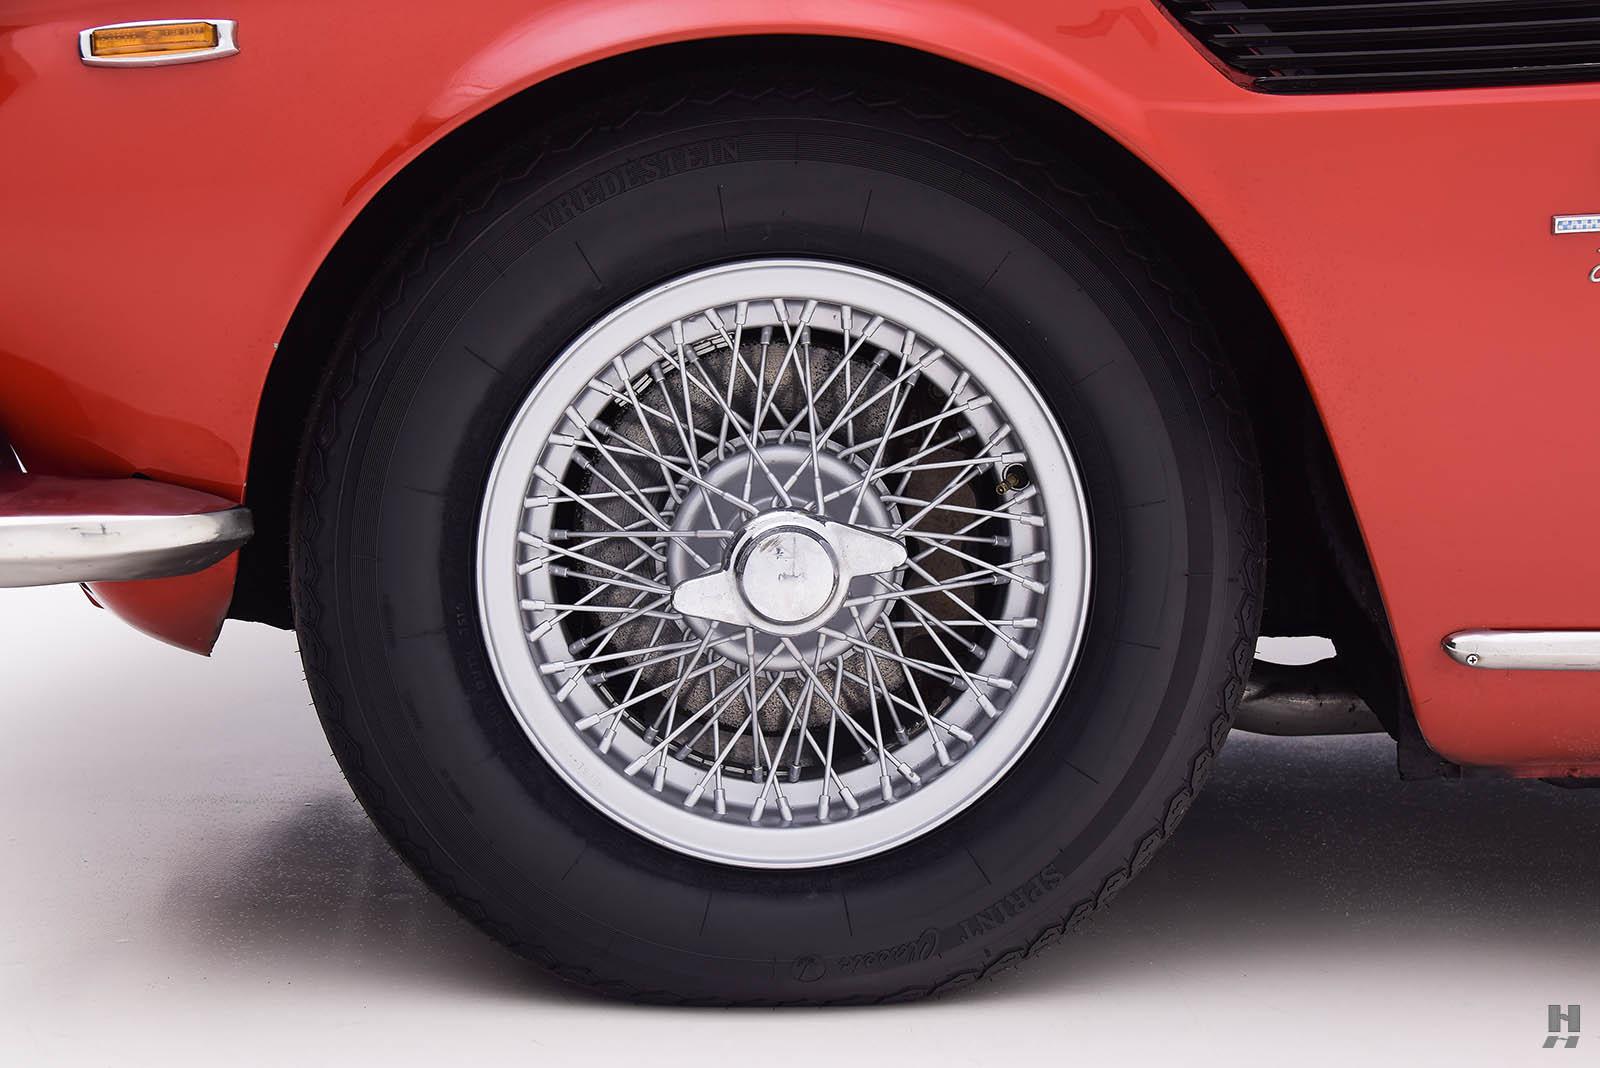 1969 Iso Rivolta Ir 340 Coupe Hyman Ltd Classic Cars